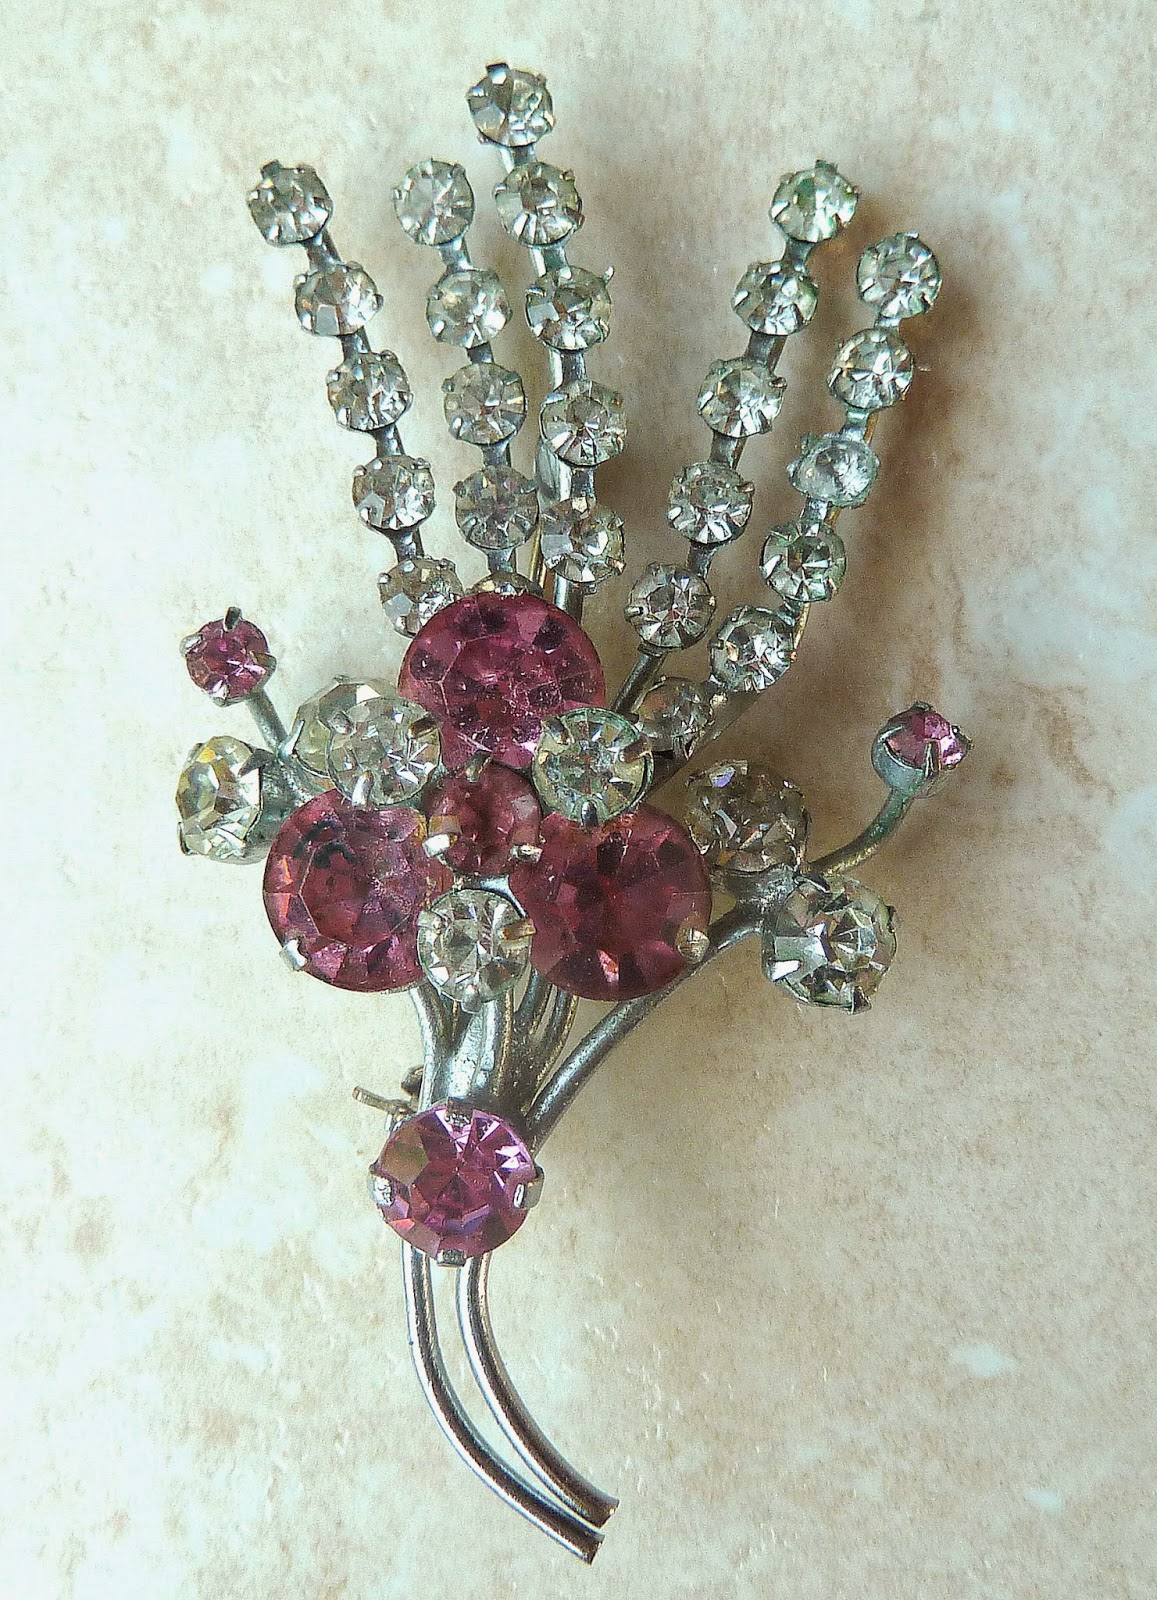 http://www.kcavintagegems.uk/vintage-pink-and-clear-rhinestone-brooch-345-p.asp